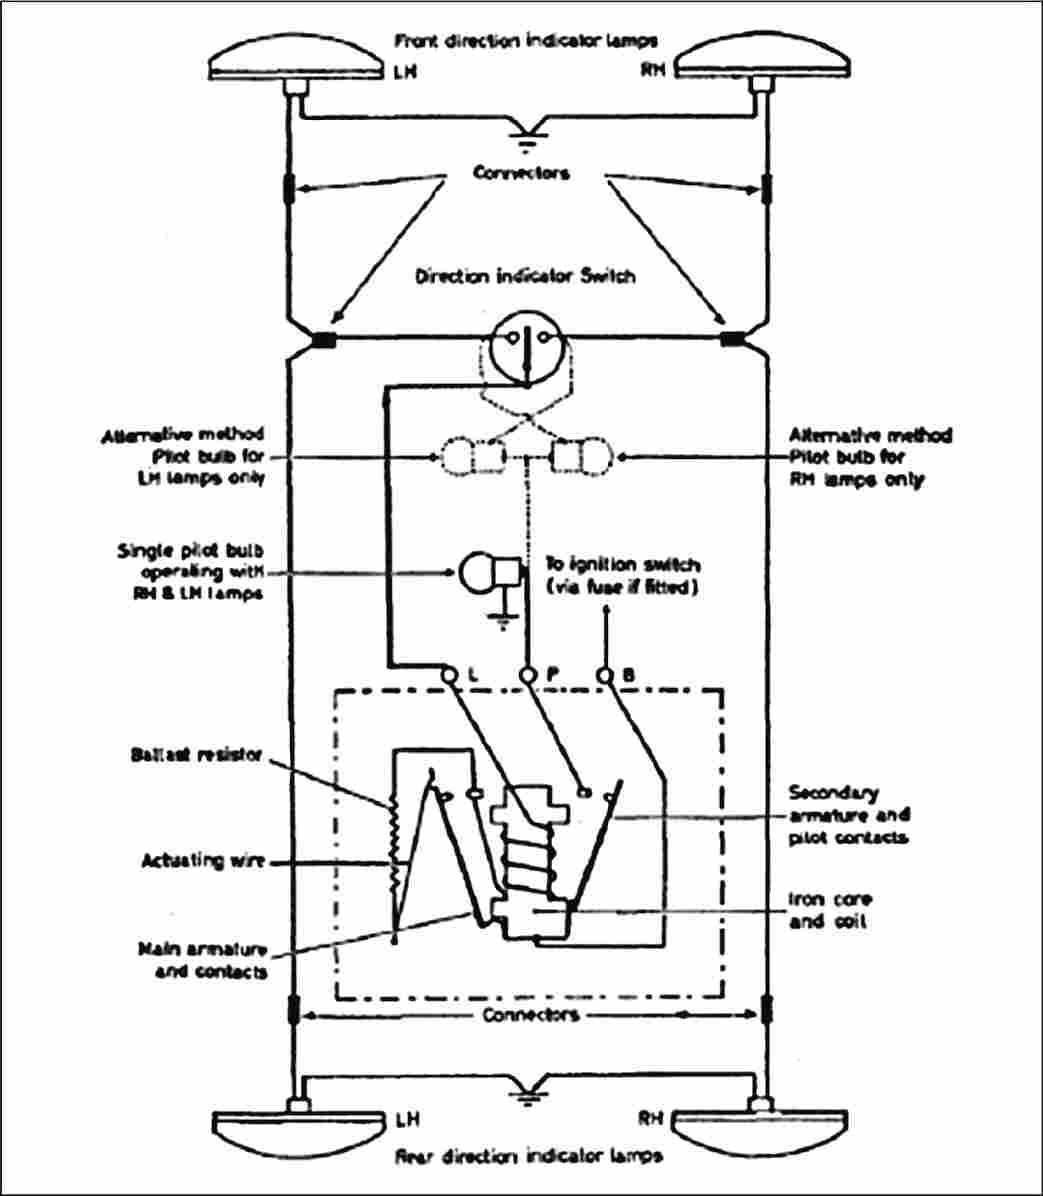 wiring diagram l 3 pin flasher unit wiring diagram Switch Wiring Diagram Wheel small resolution of wiring diagram l